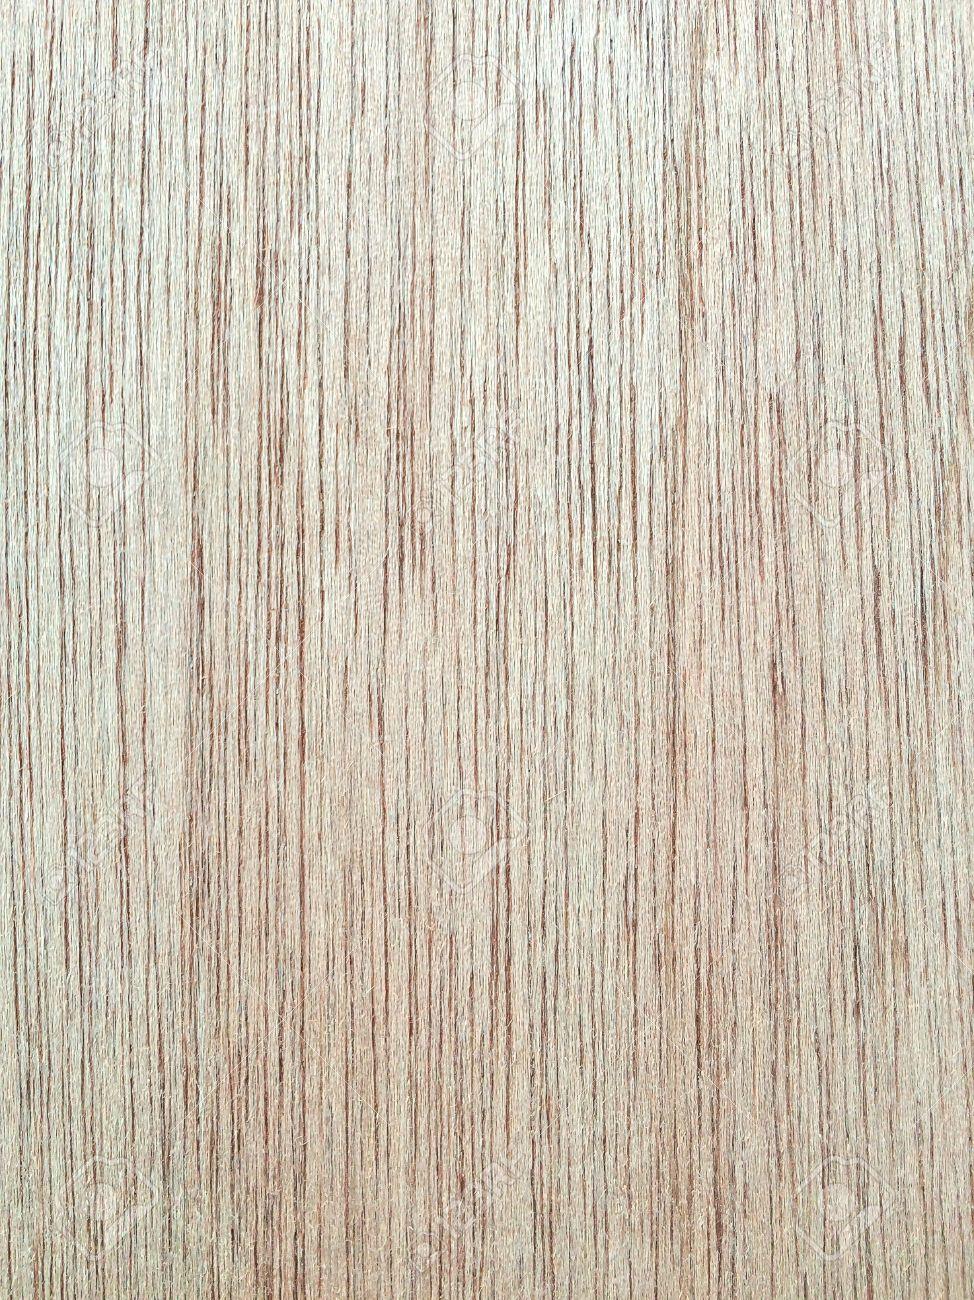 Seamless Texture De Bois Clair